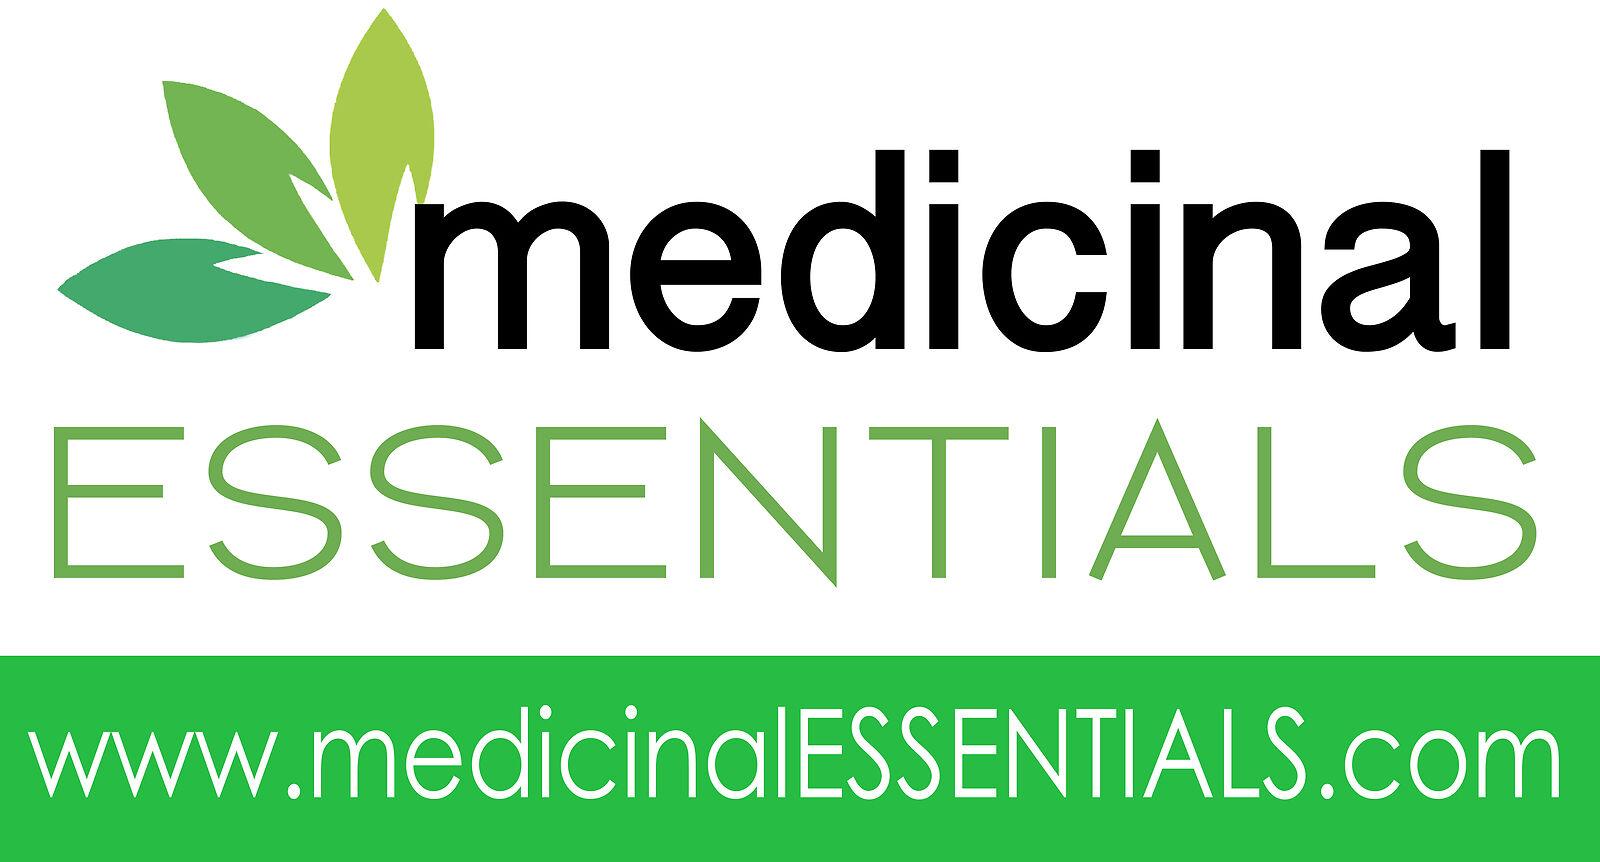 medicinalessentials